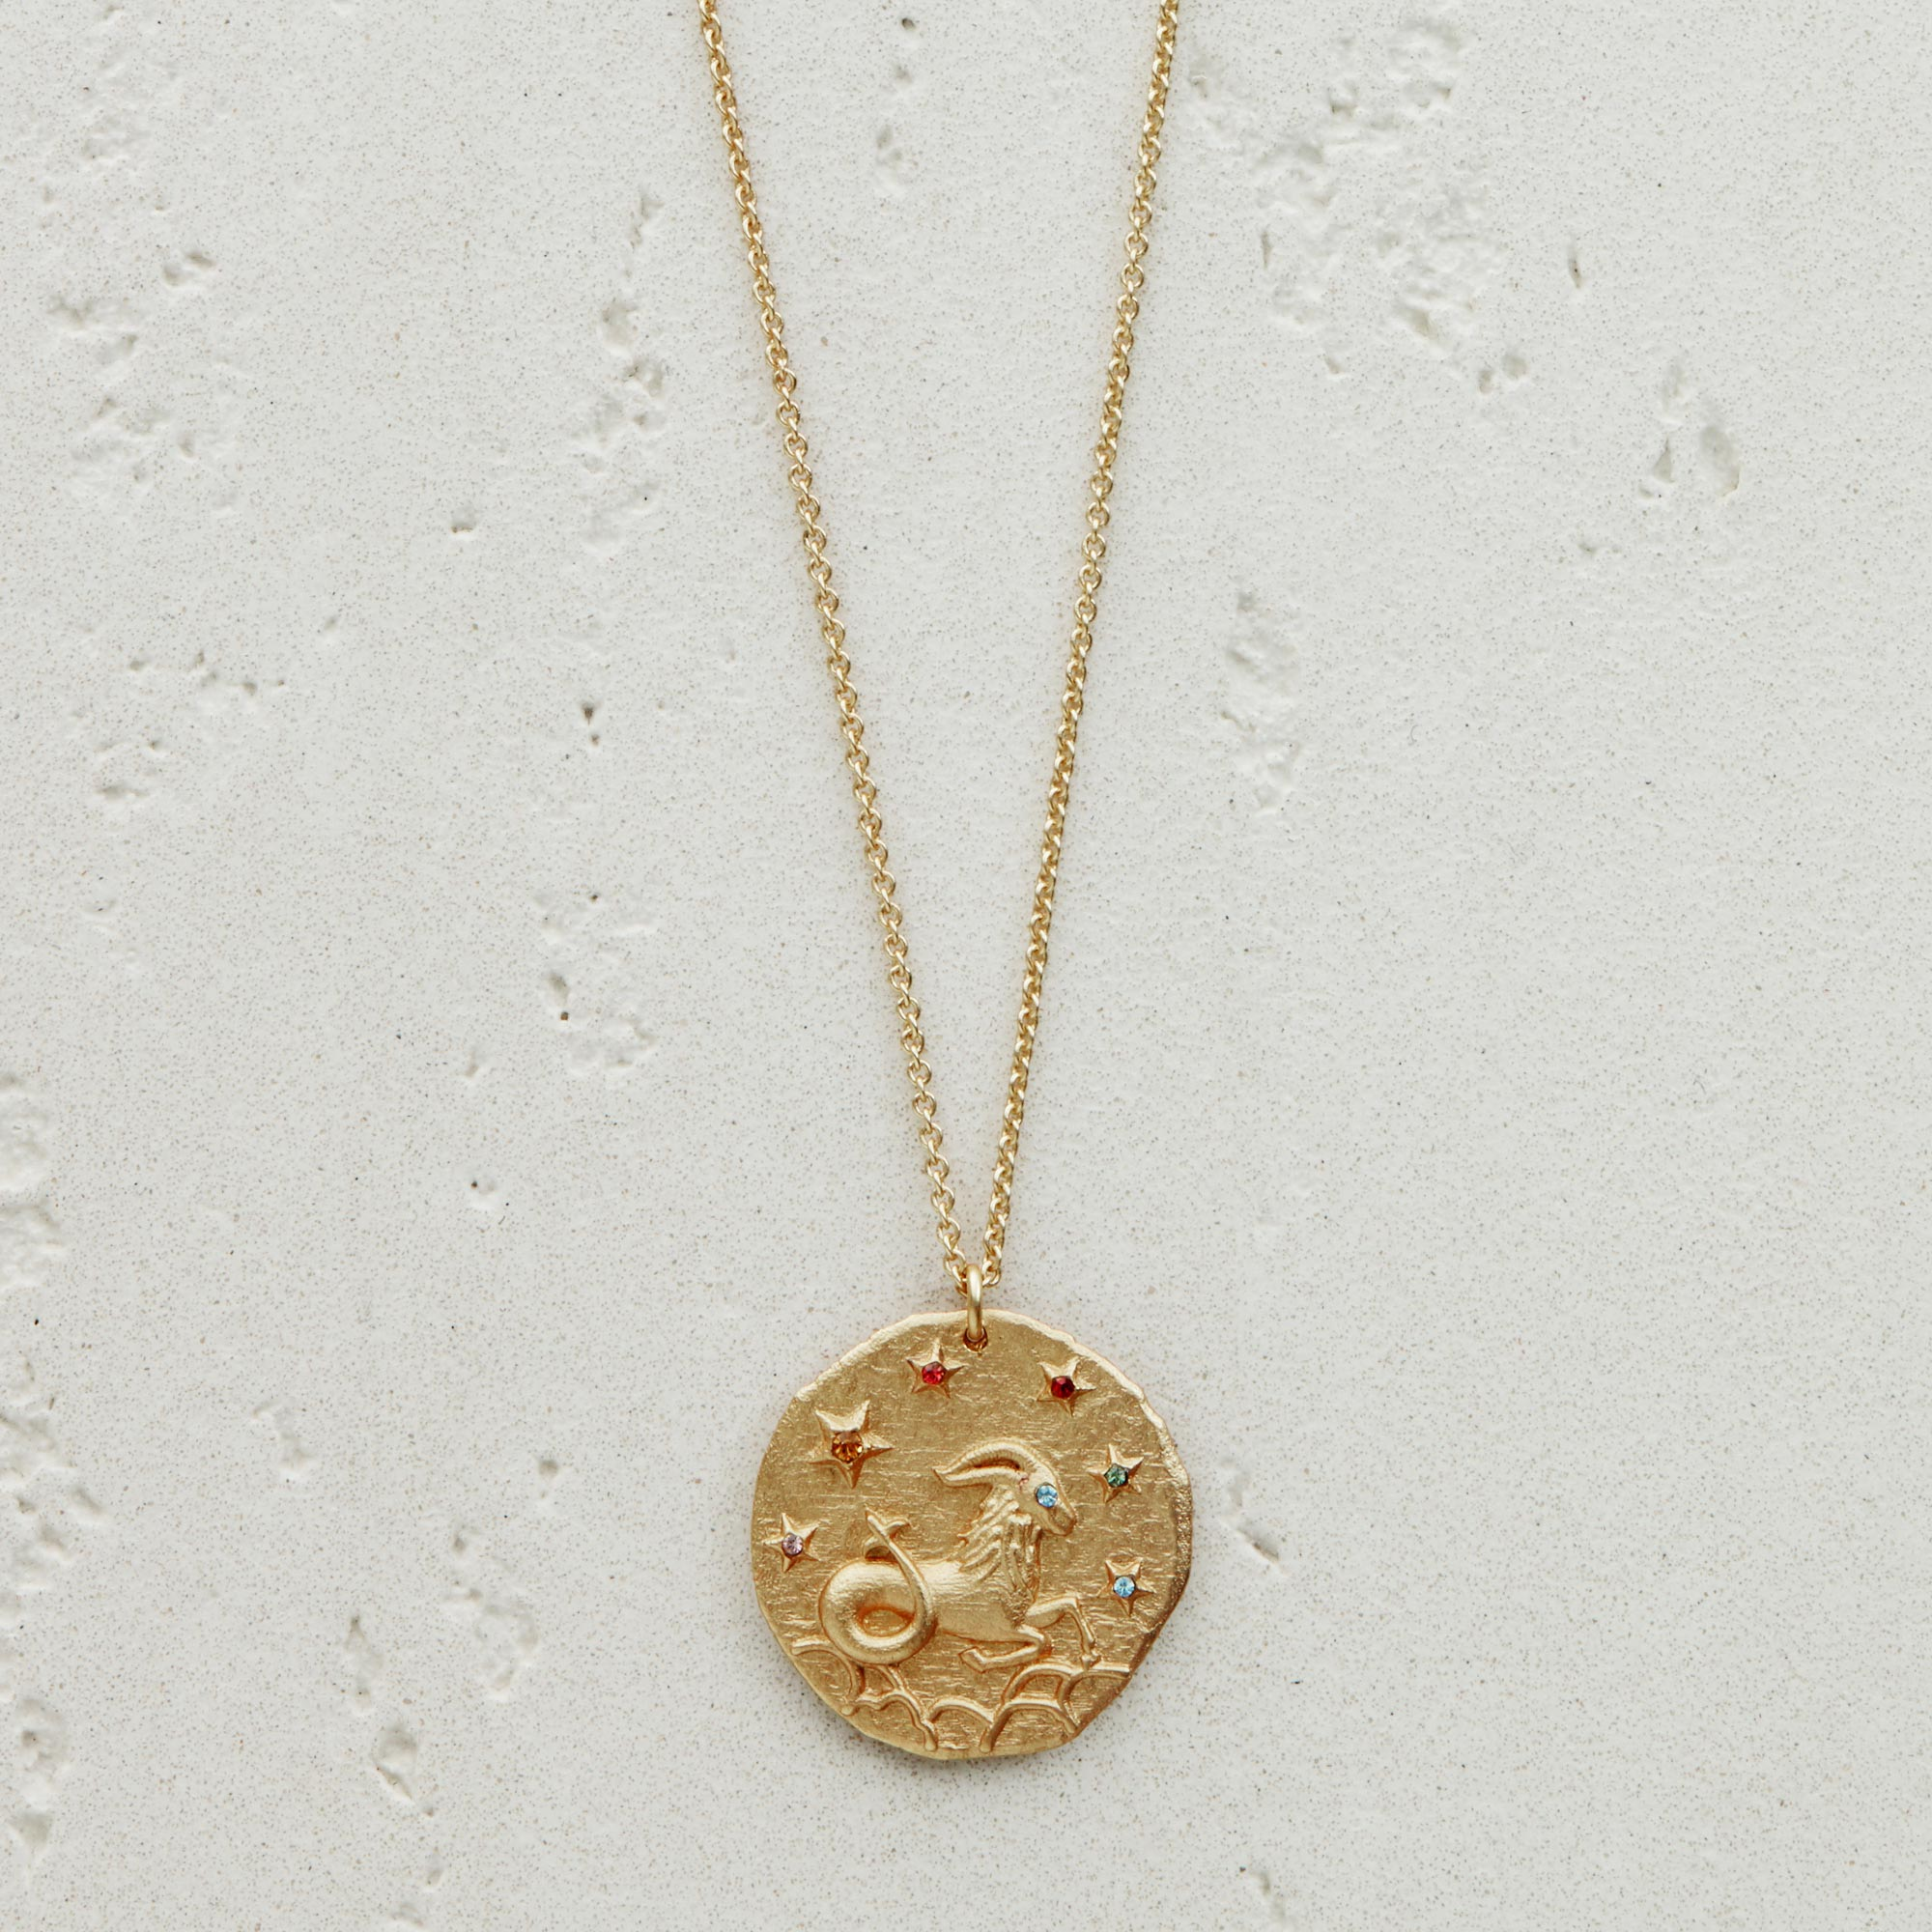 Capricorn Astro necklace - Gold